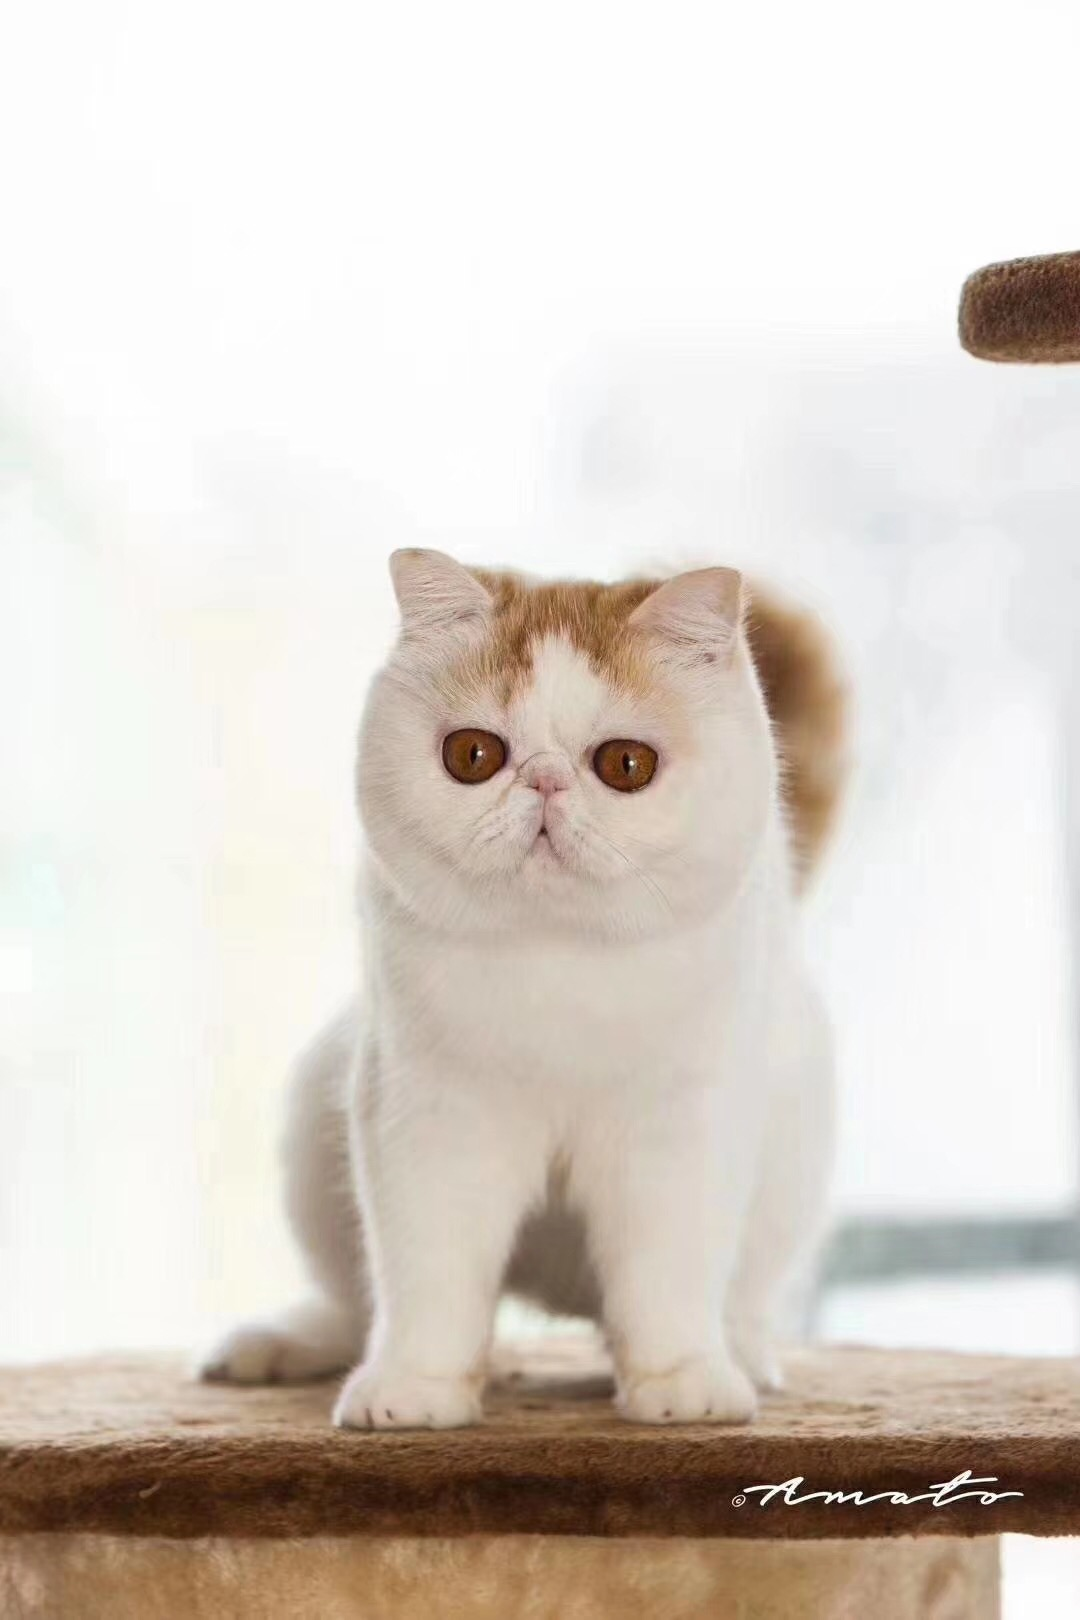 cfa认证猫舍 精品加菲猫繁殖基地 纯种繁殖猫舍